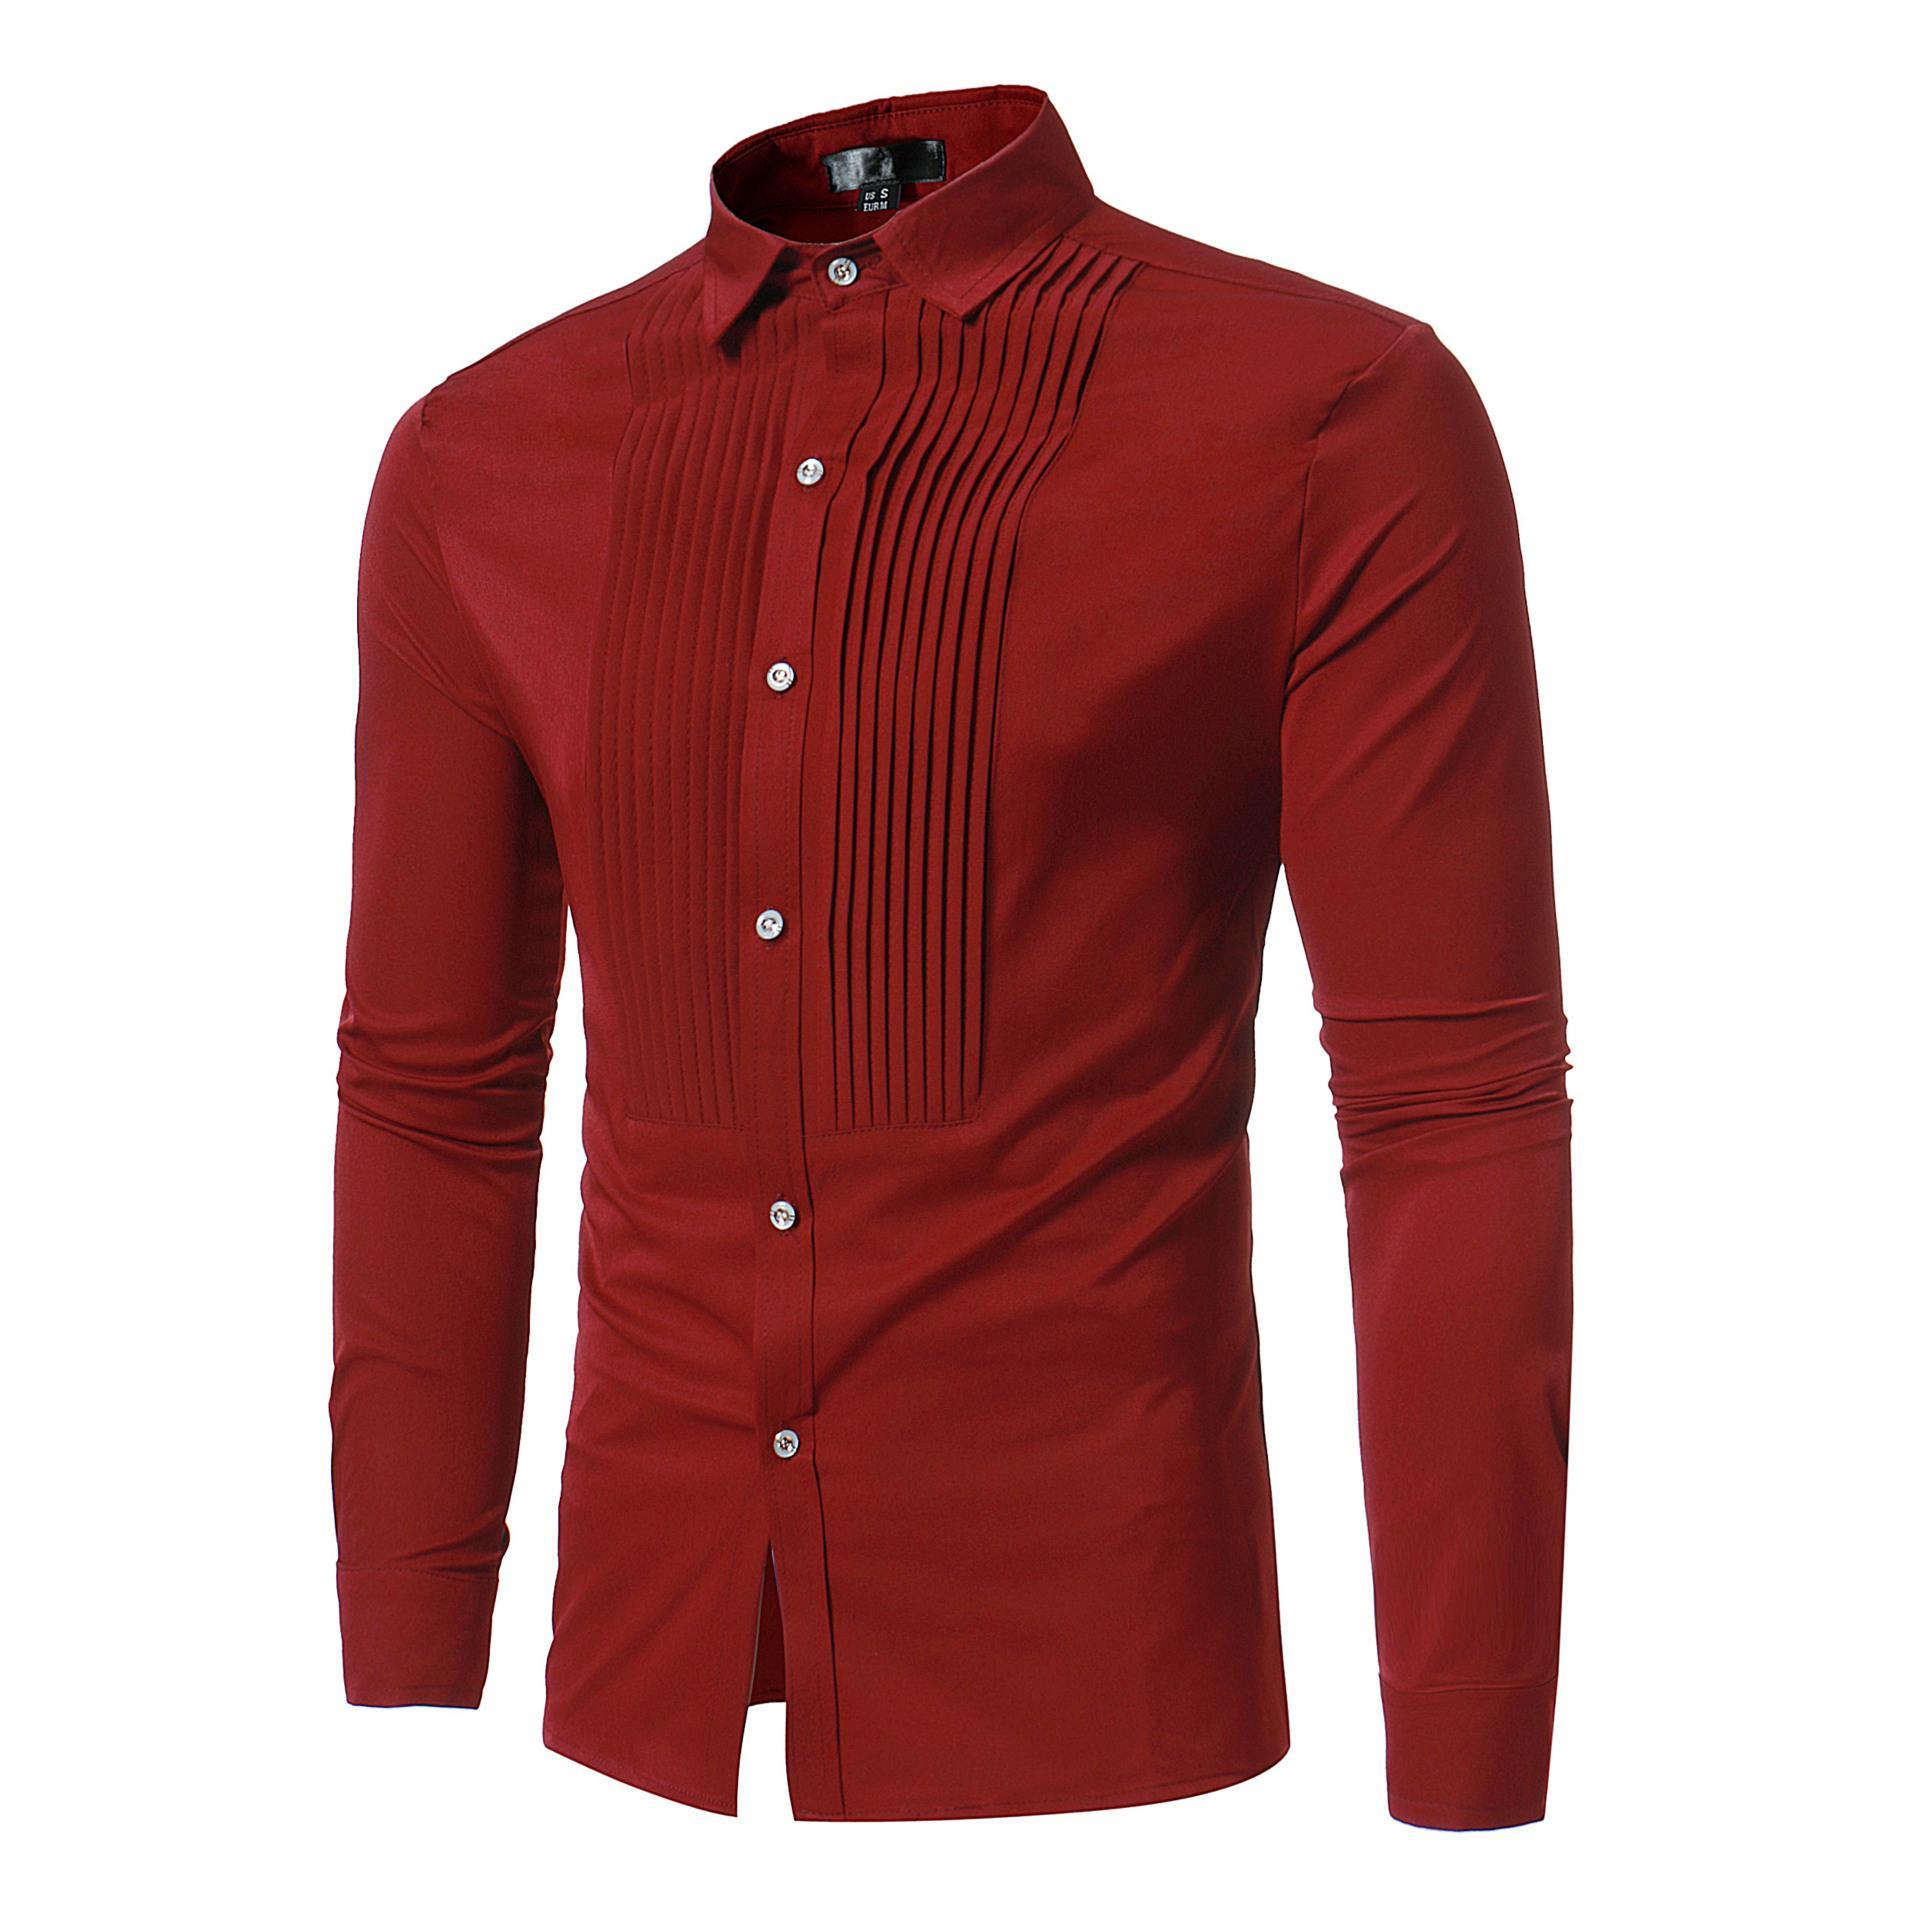 New fashion hot sale shirt men Solid color base shirt hot men's front placket design long-sleeved men shirt 3 color S-XL free shipping